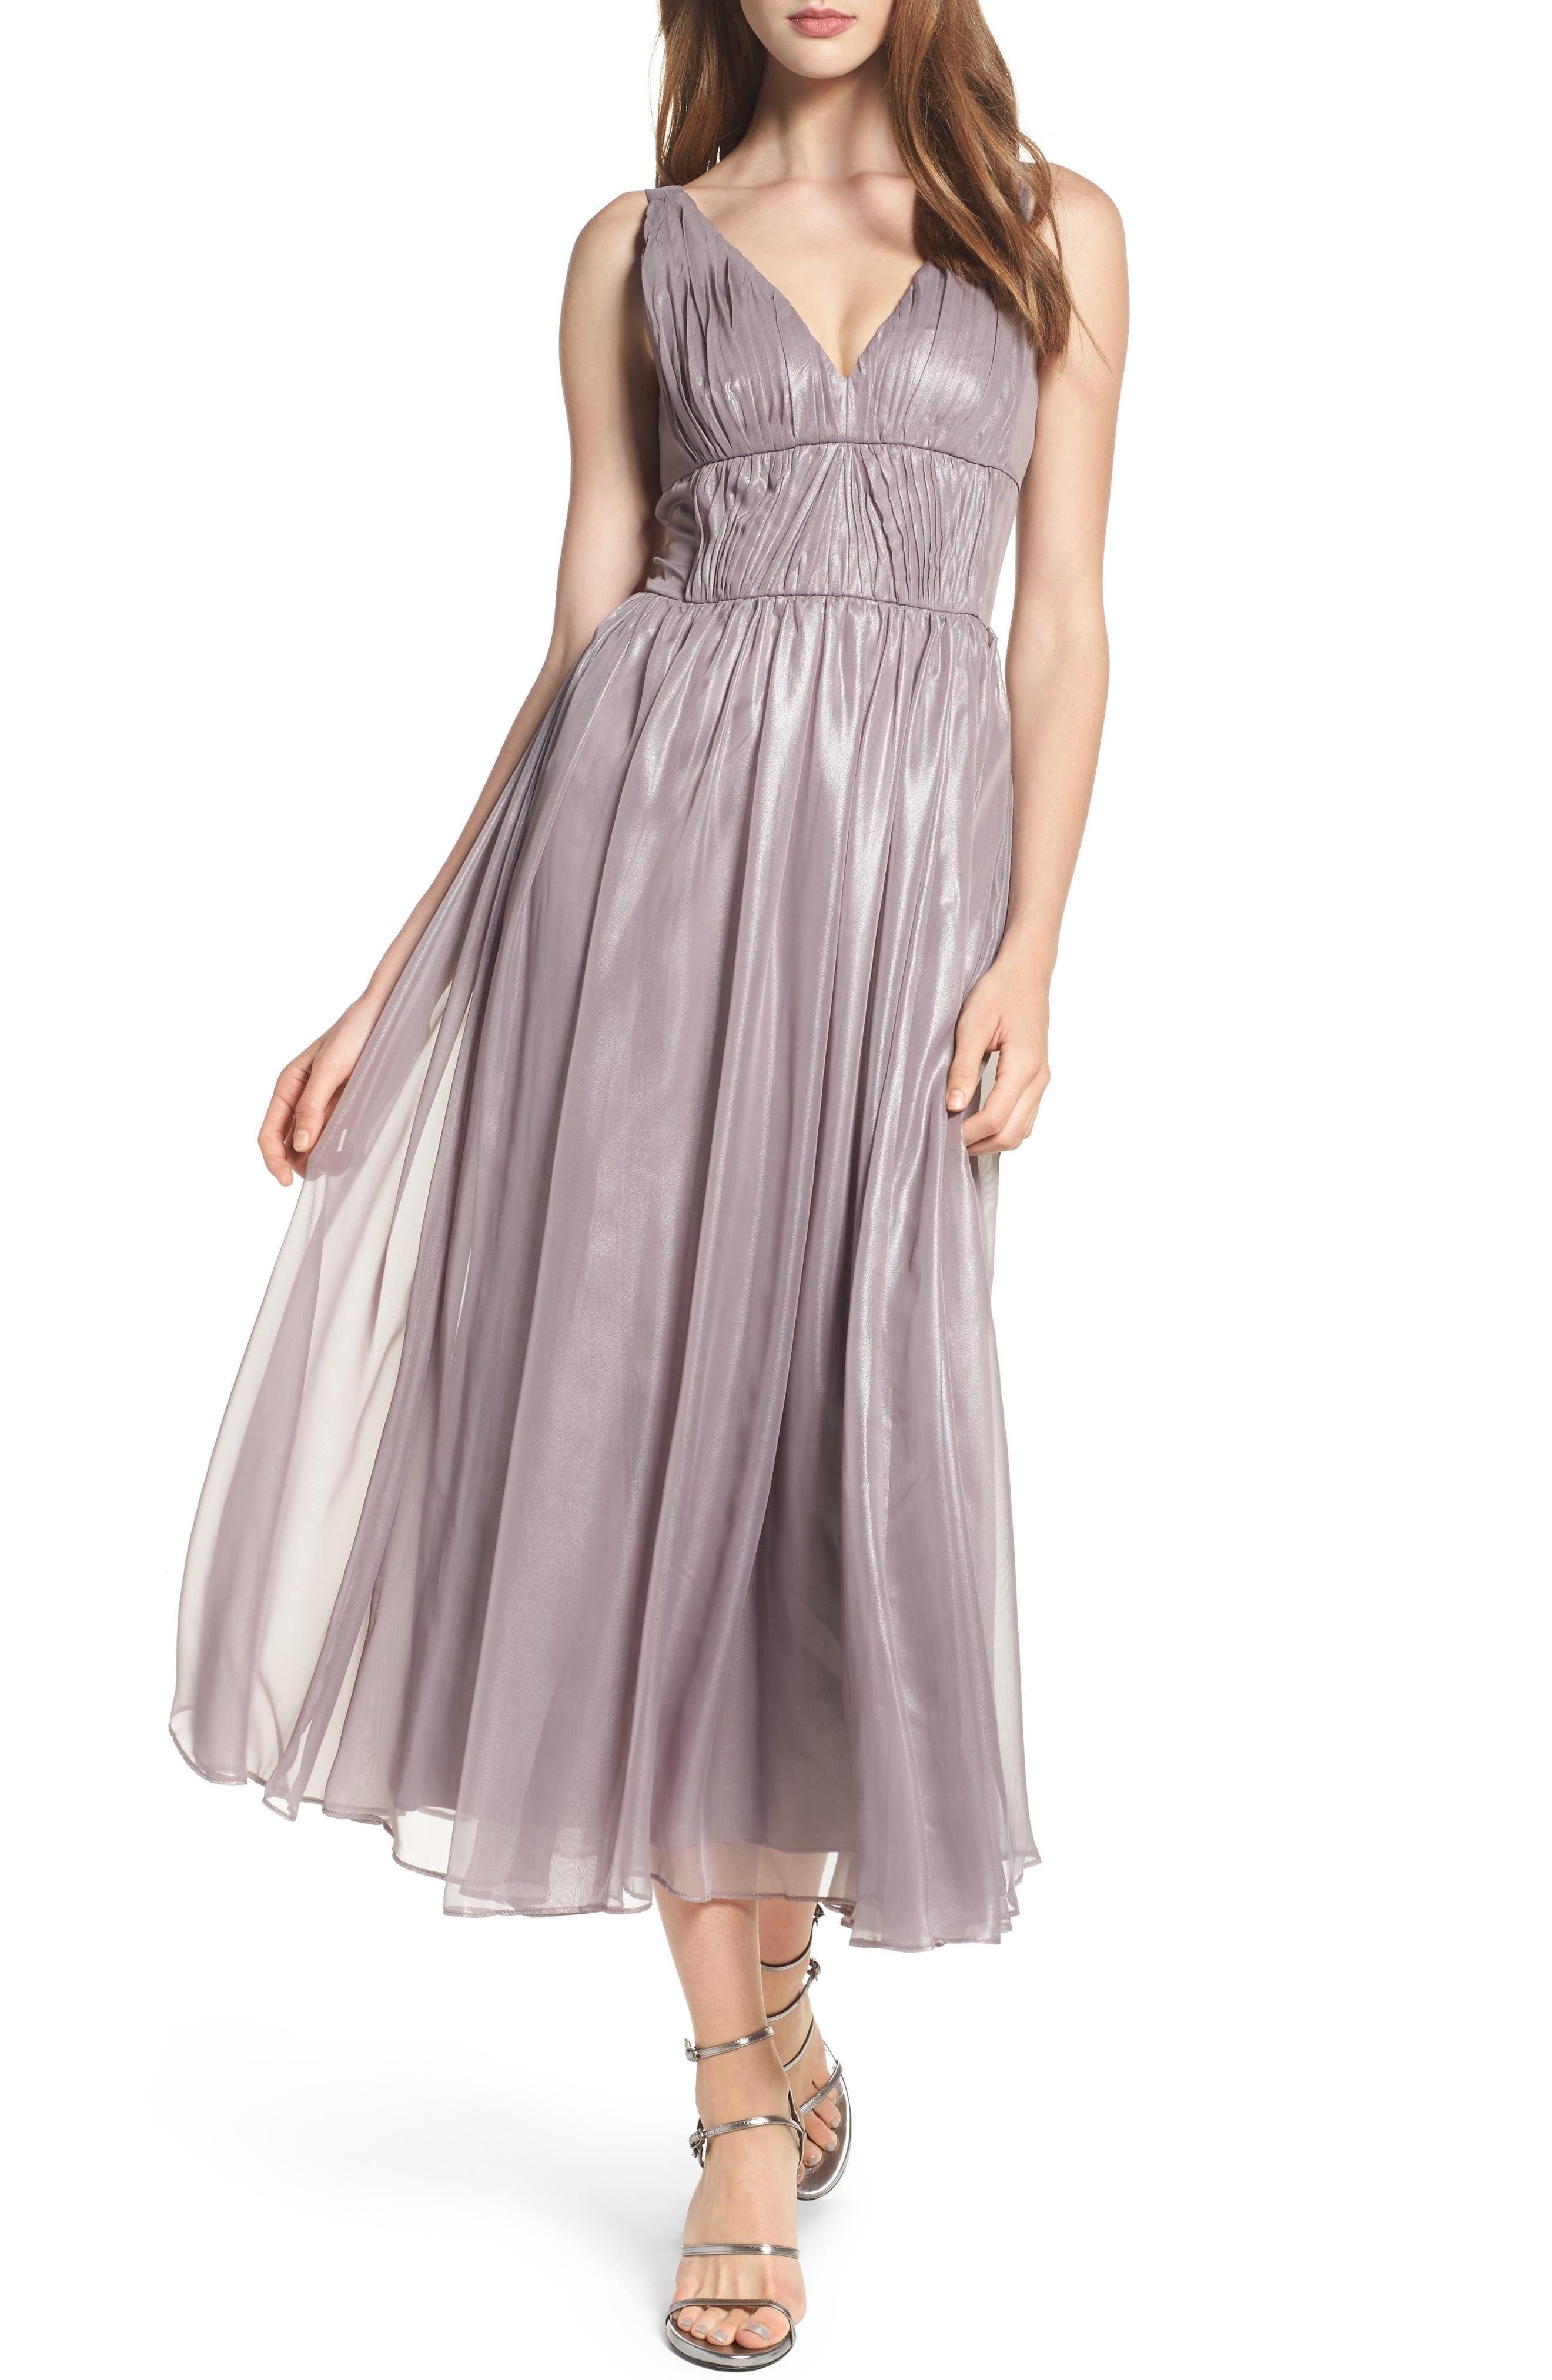 Vera Wang Empire Waist Ruched Cocktail Dress